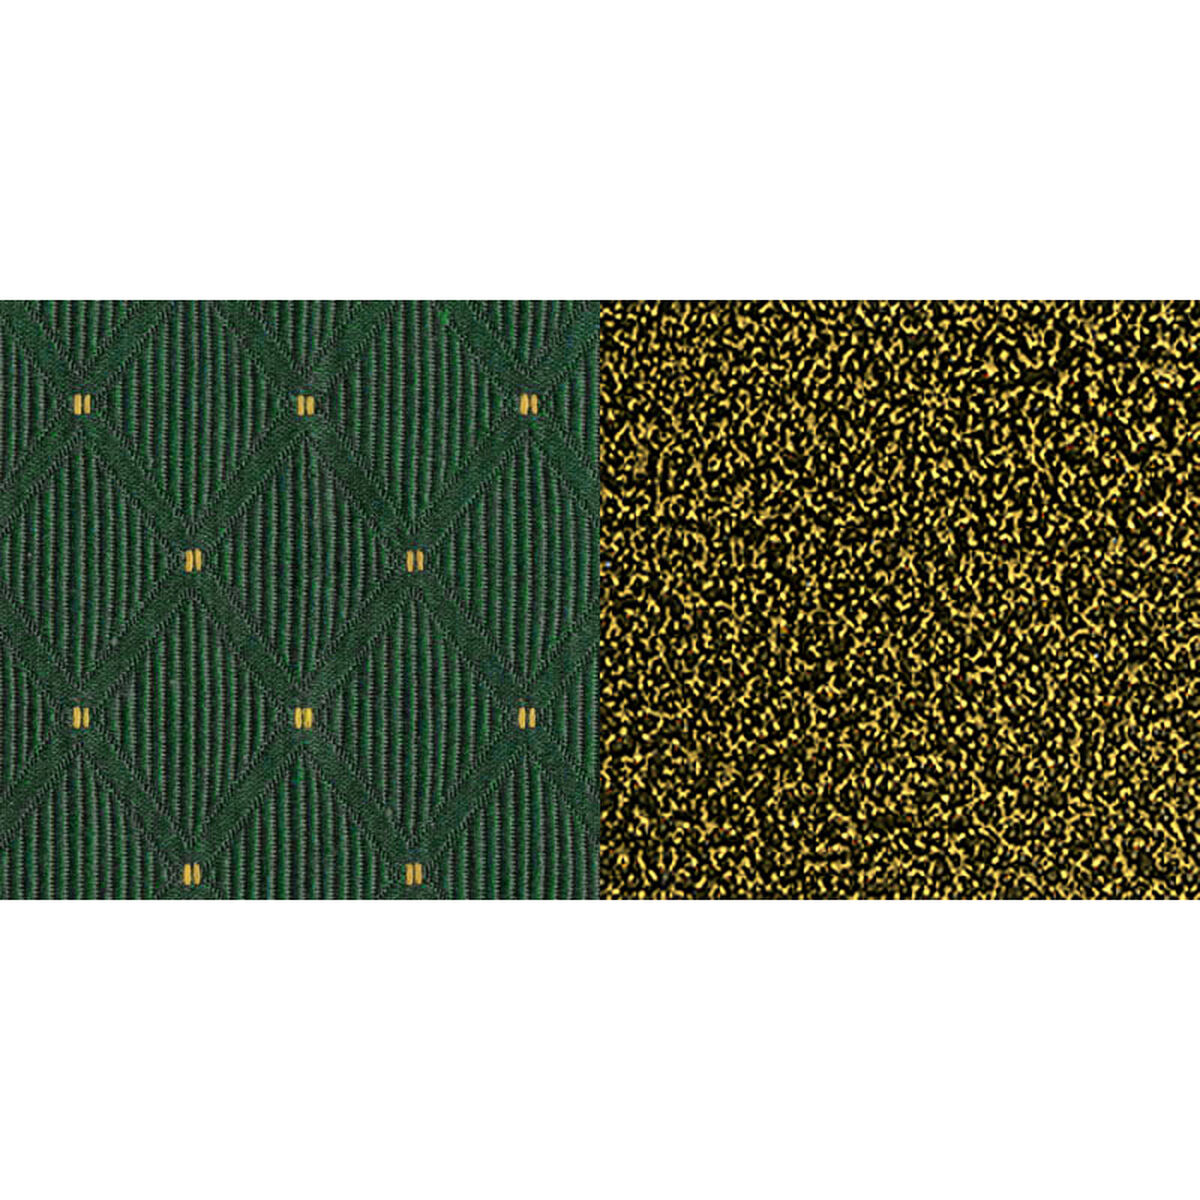 Green Dot Fabric Church Chair Fd Ch0221 4 Gv S0808 Bas Emb Gg